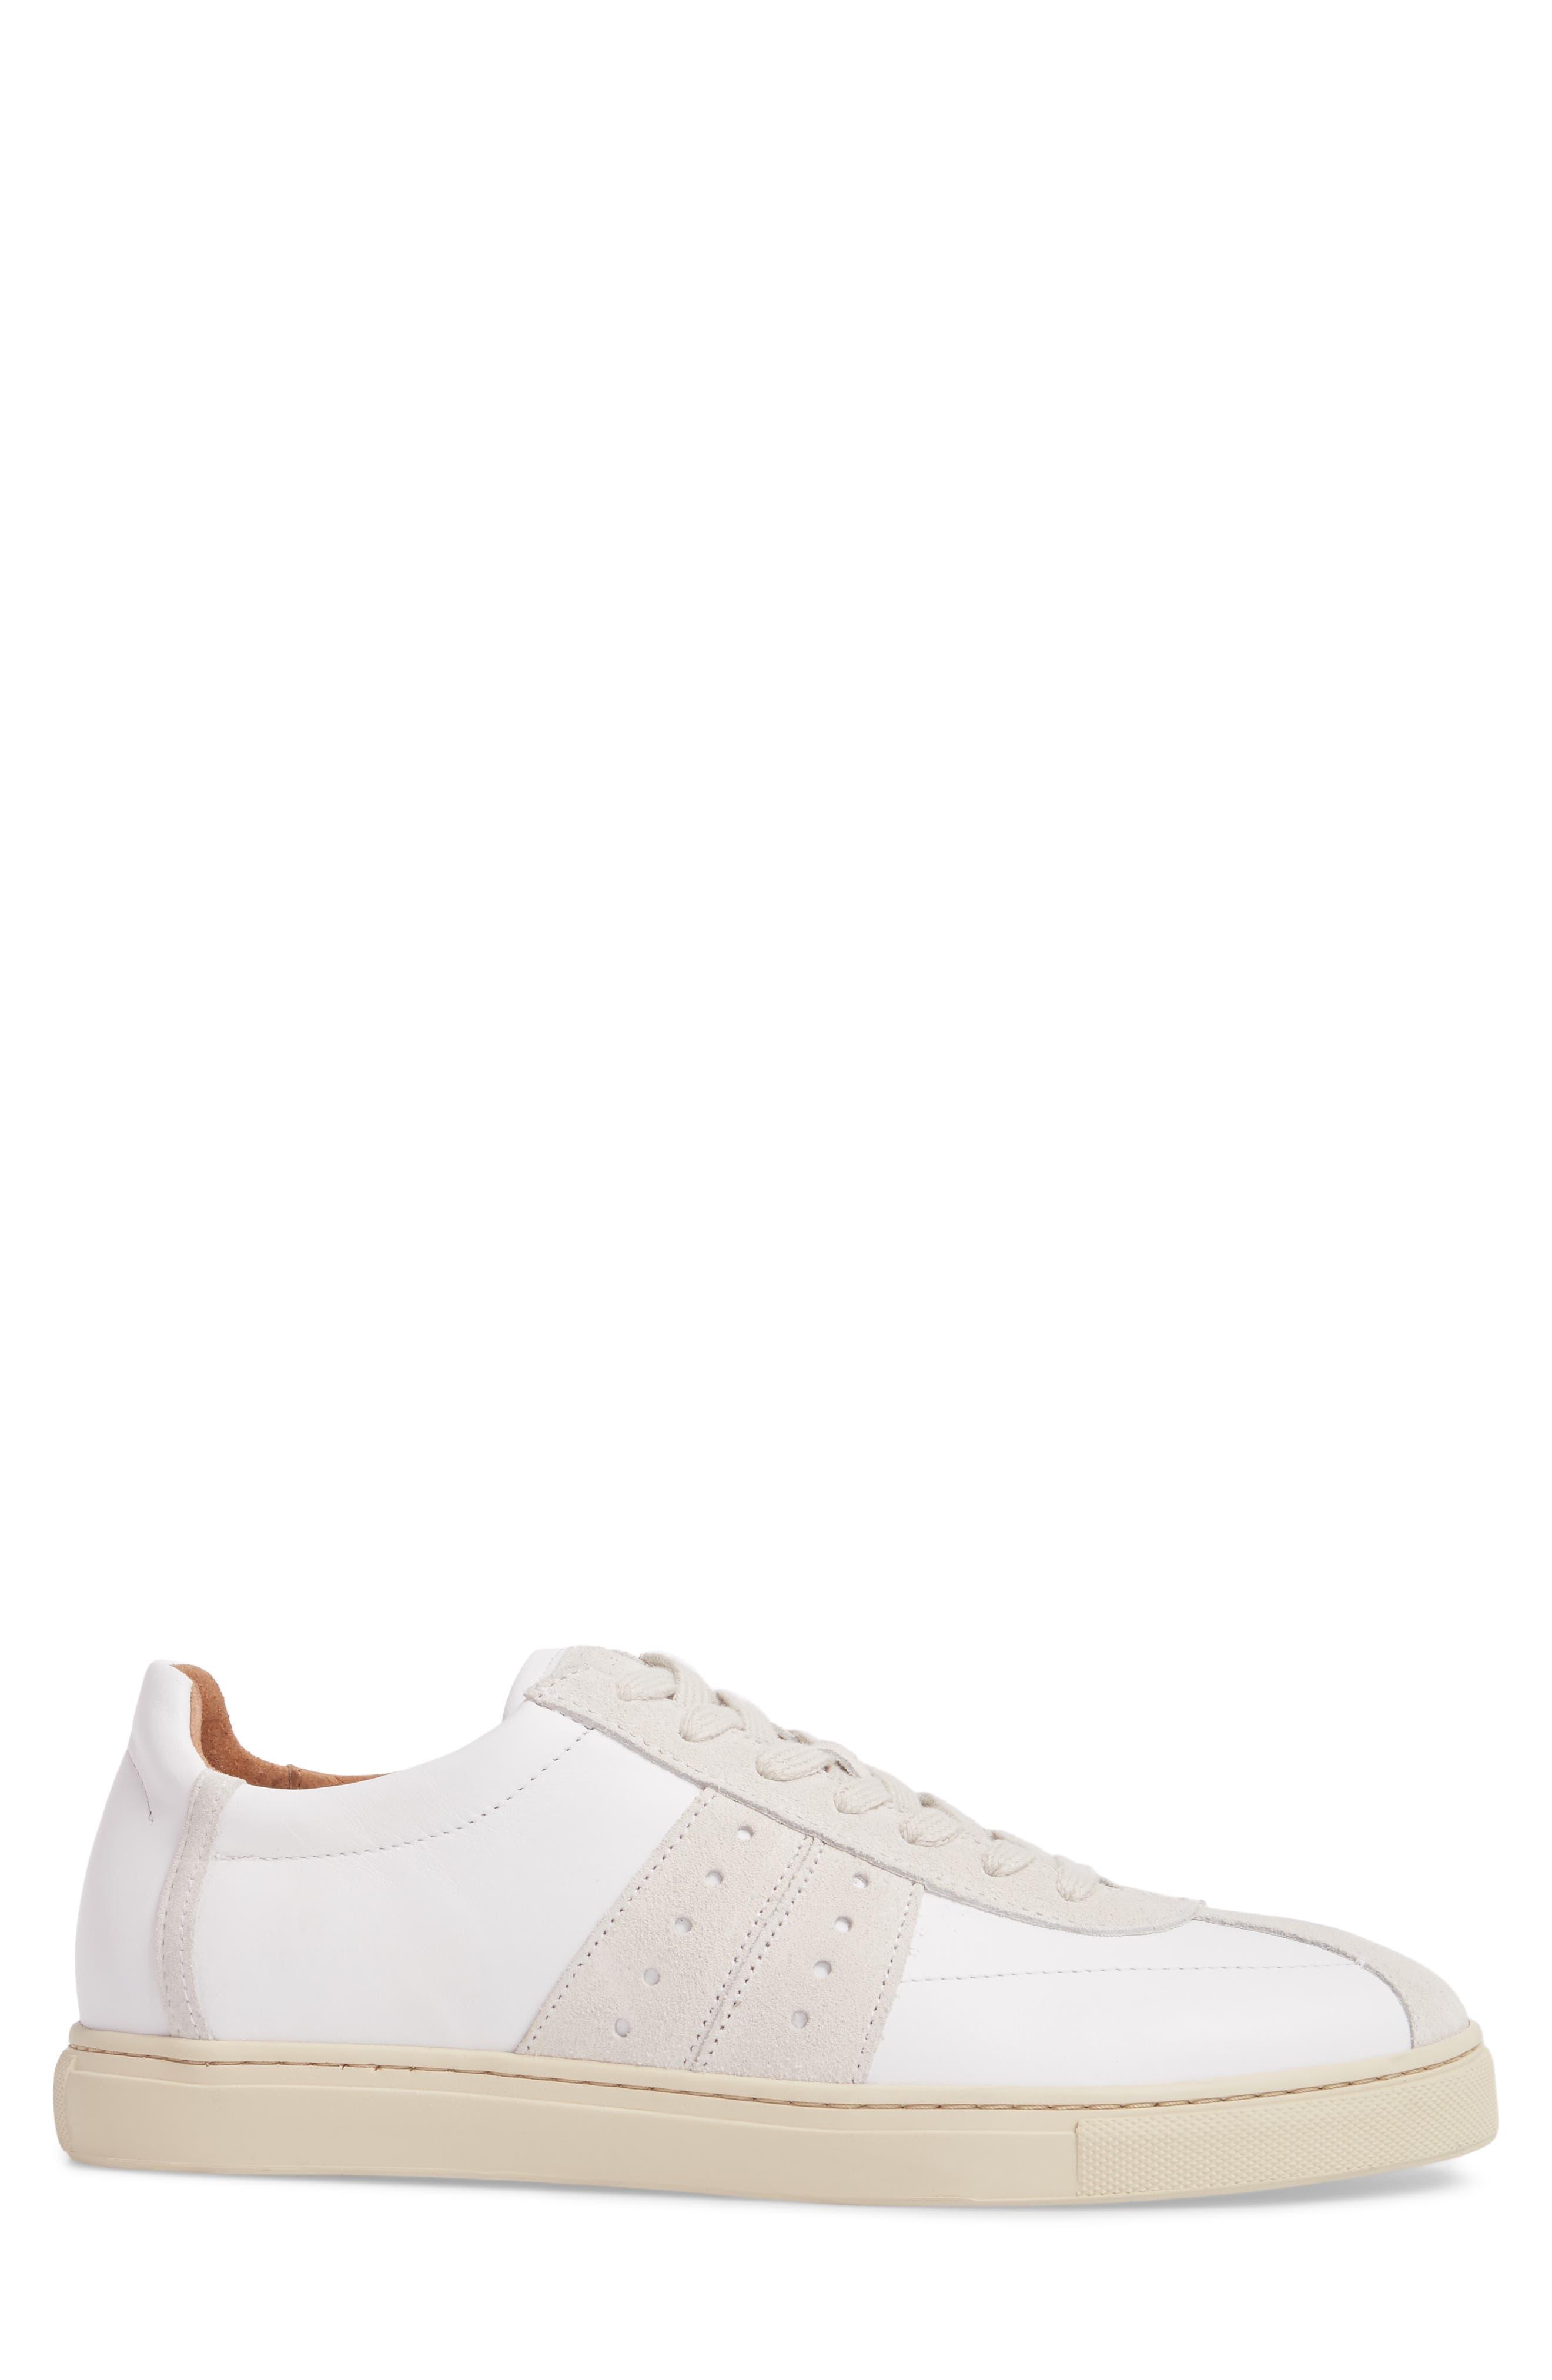 Duran New Mix Sneaker,                             Alternate thumbnail 3, color,                             100